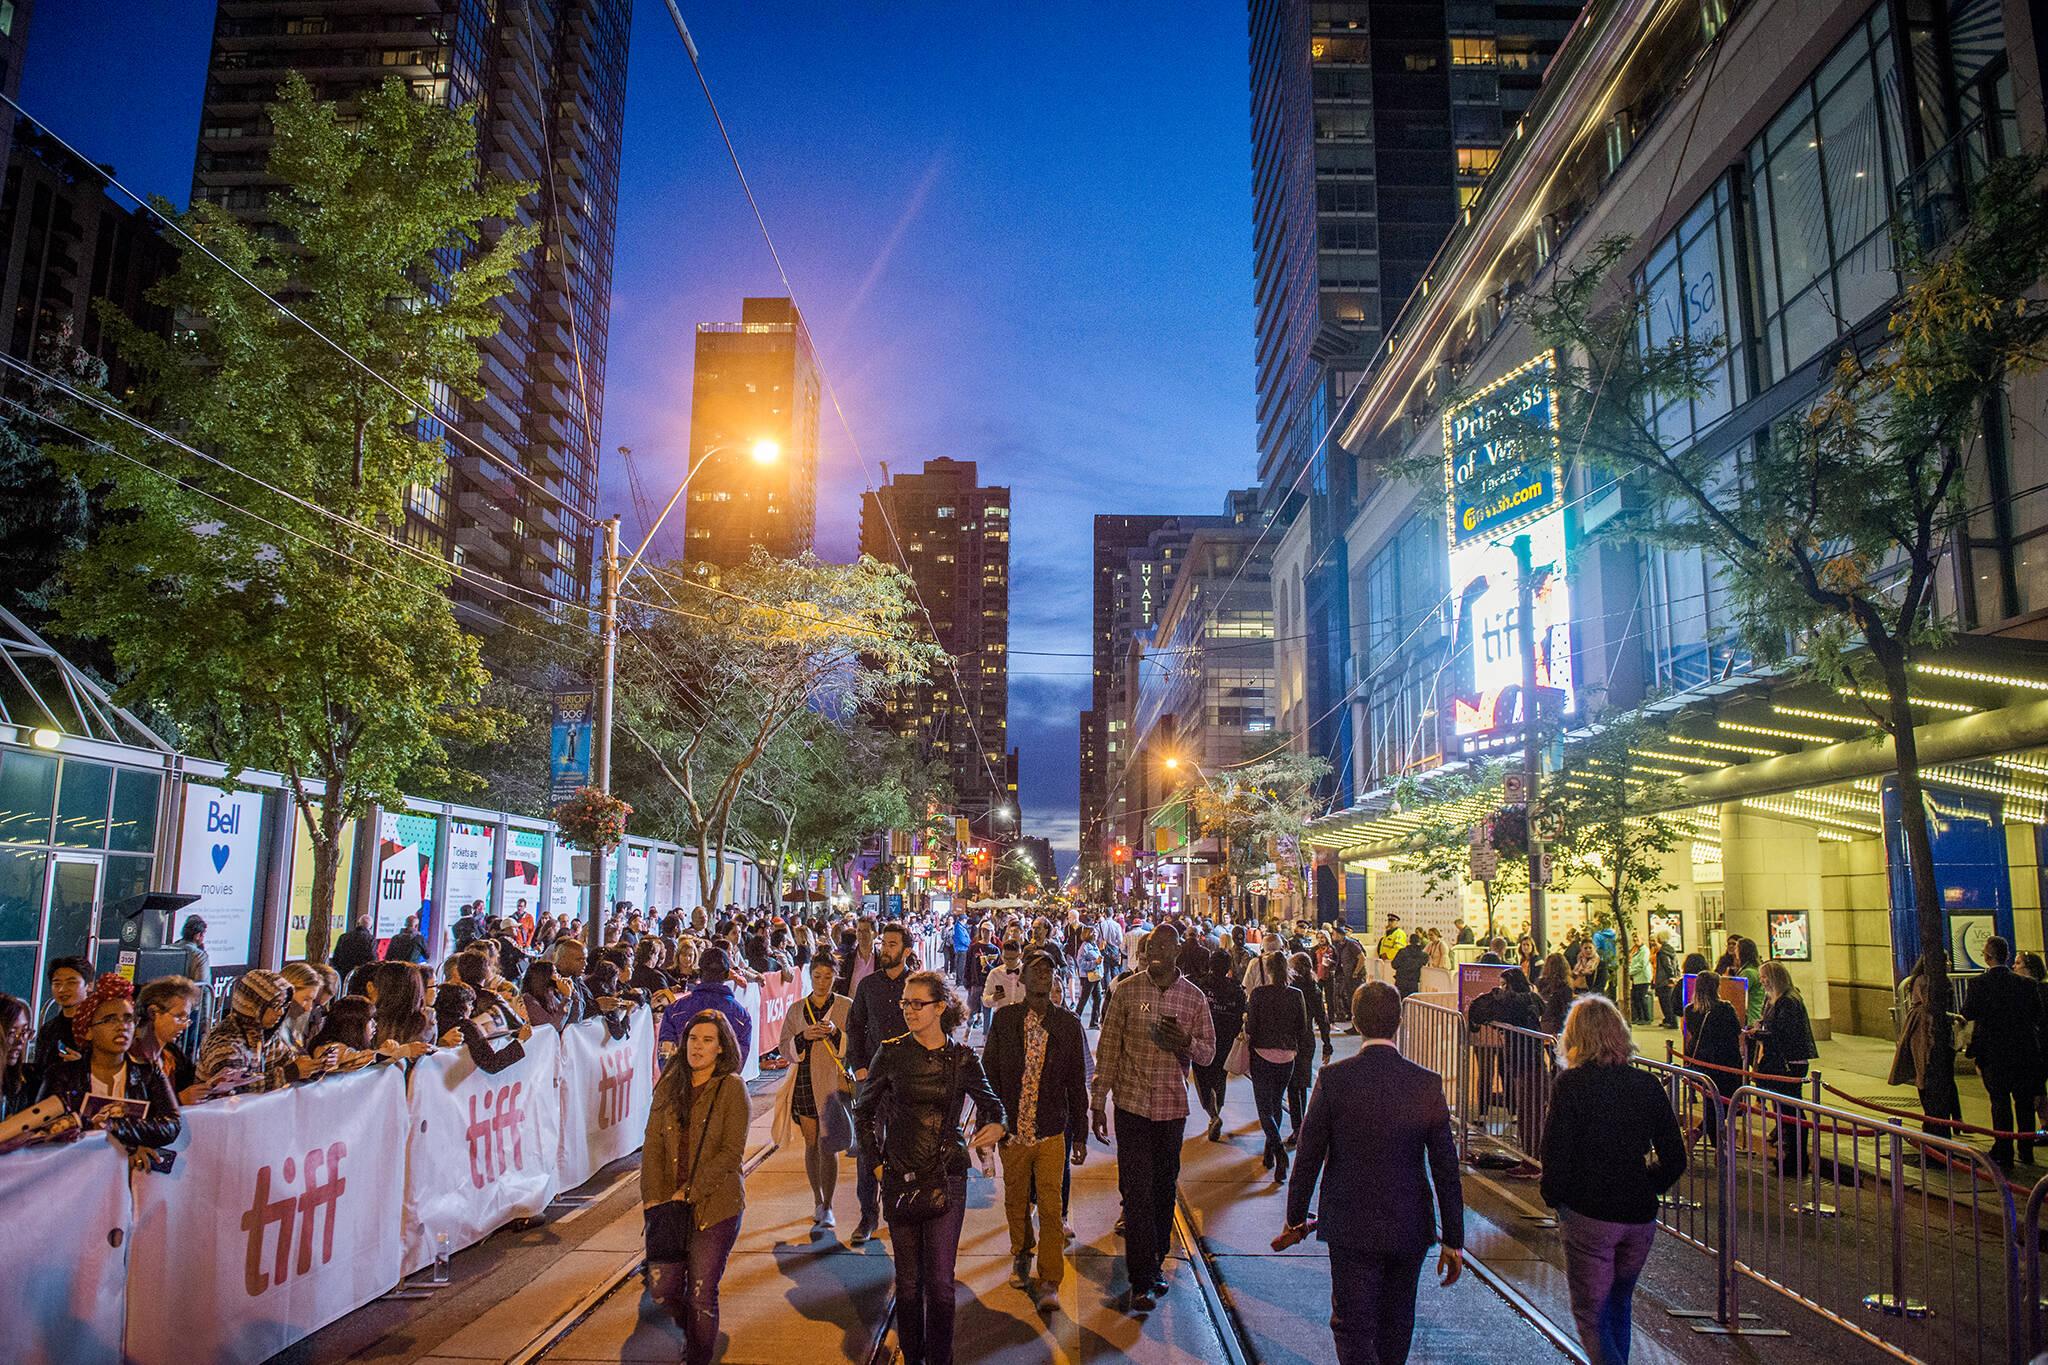 tiff street festival 2018